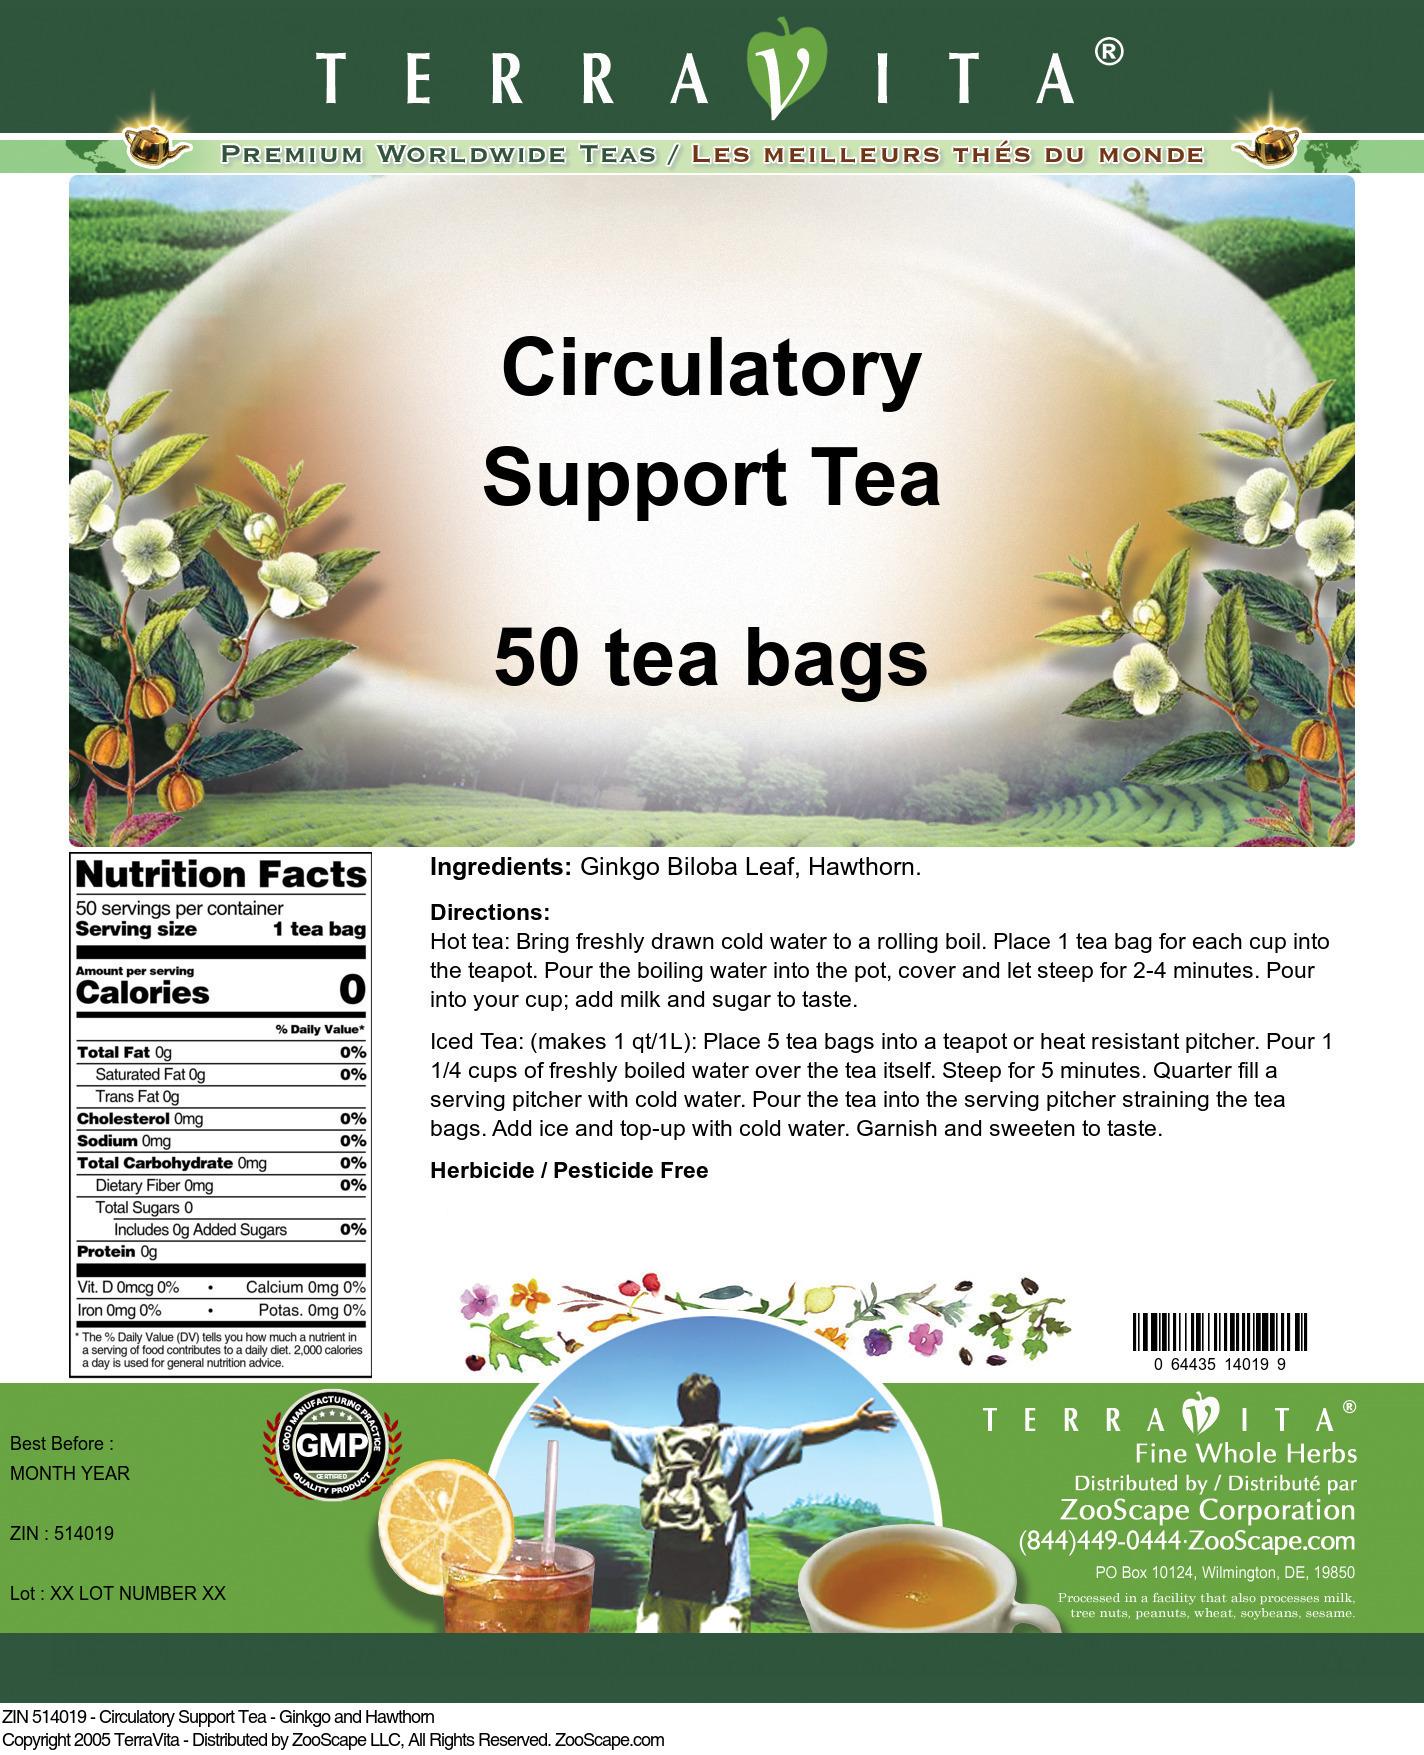 Circulatory Support Tea - Ginkgo and Hawthorn